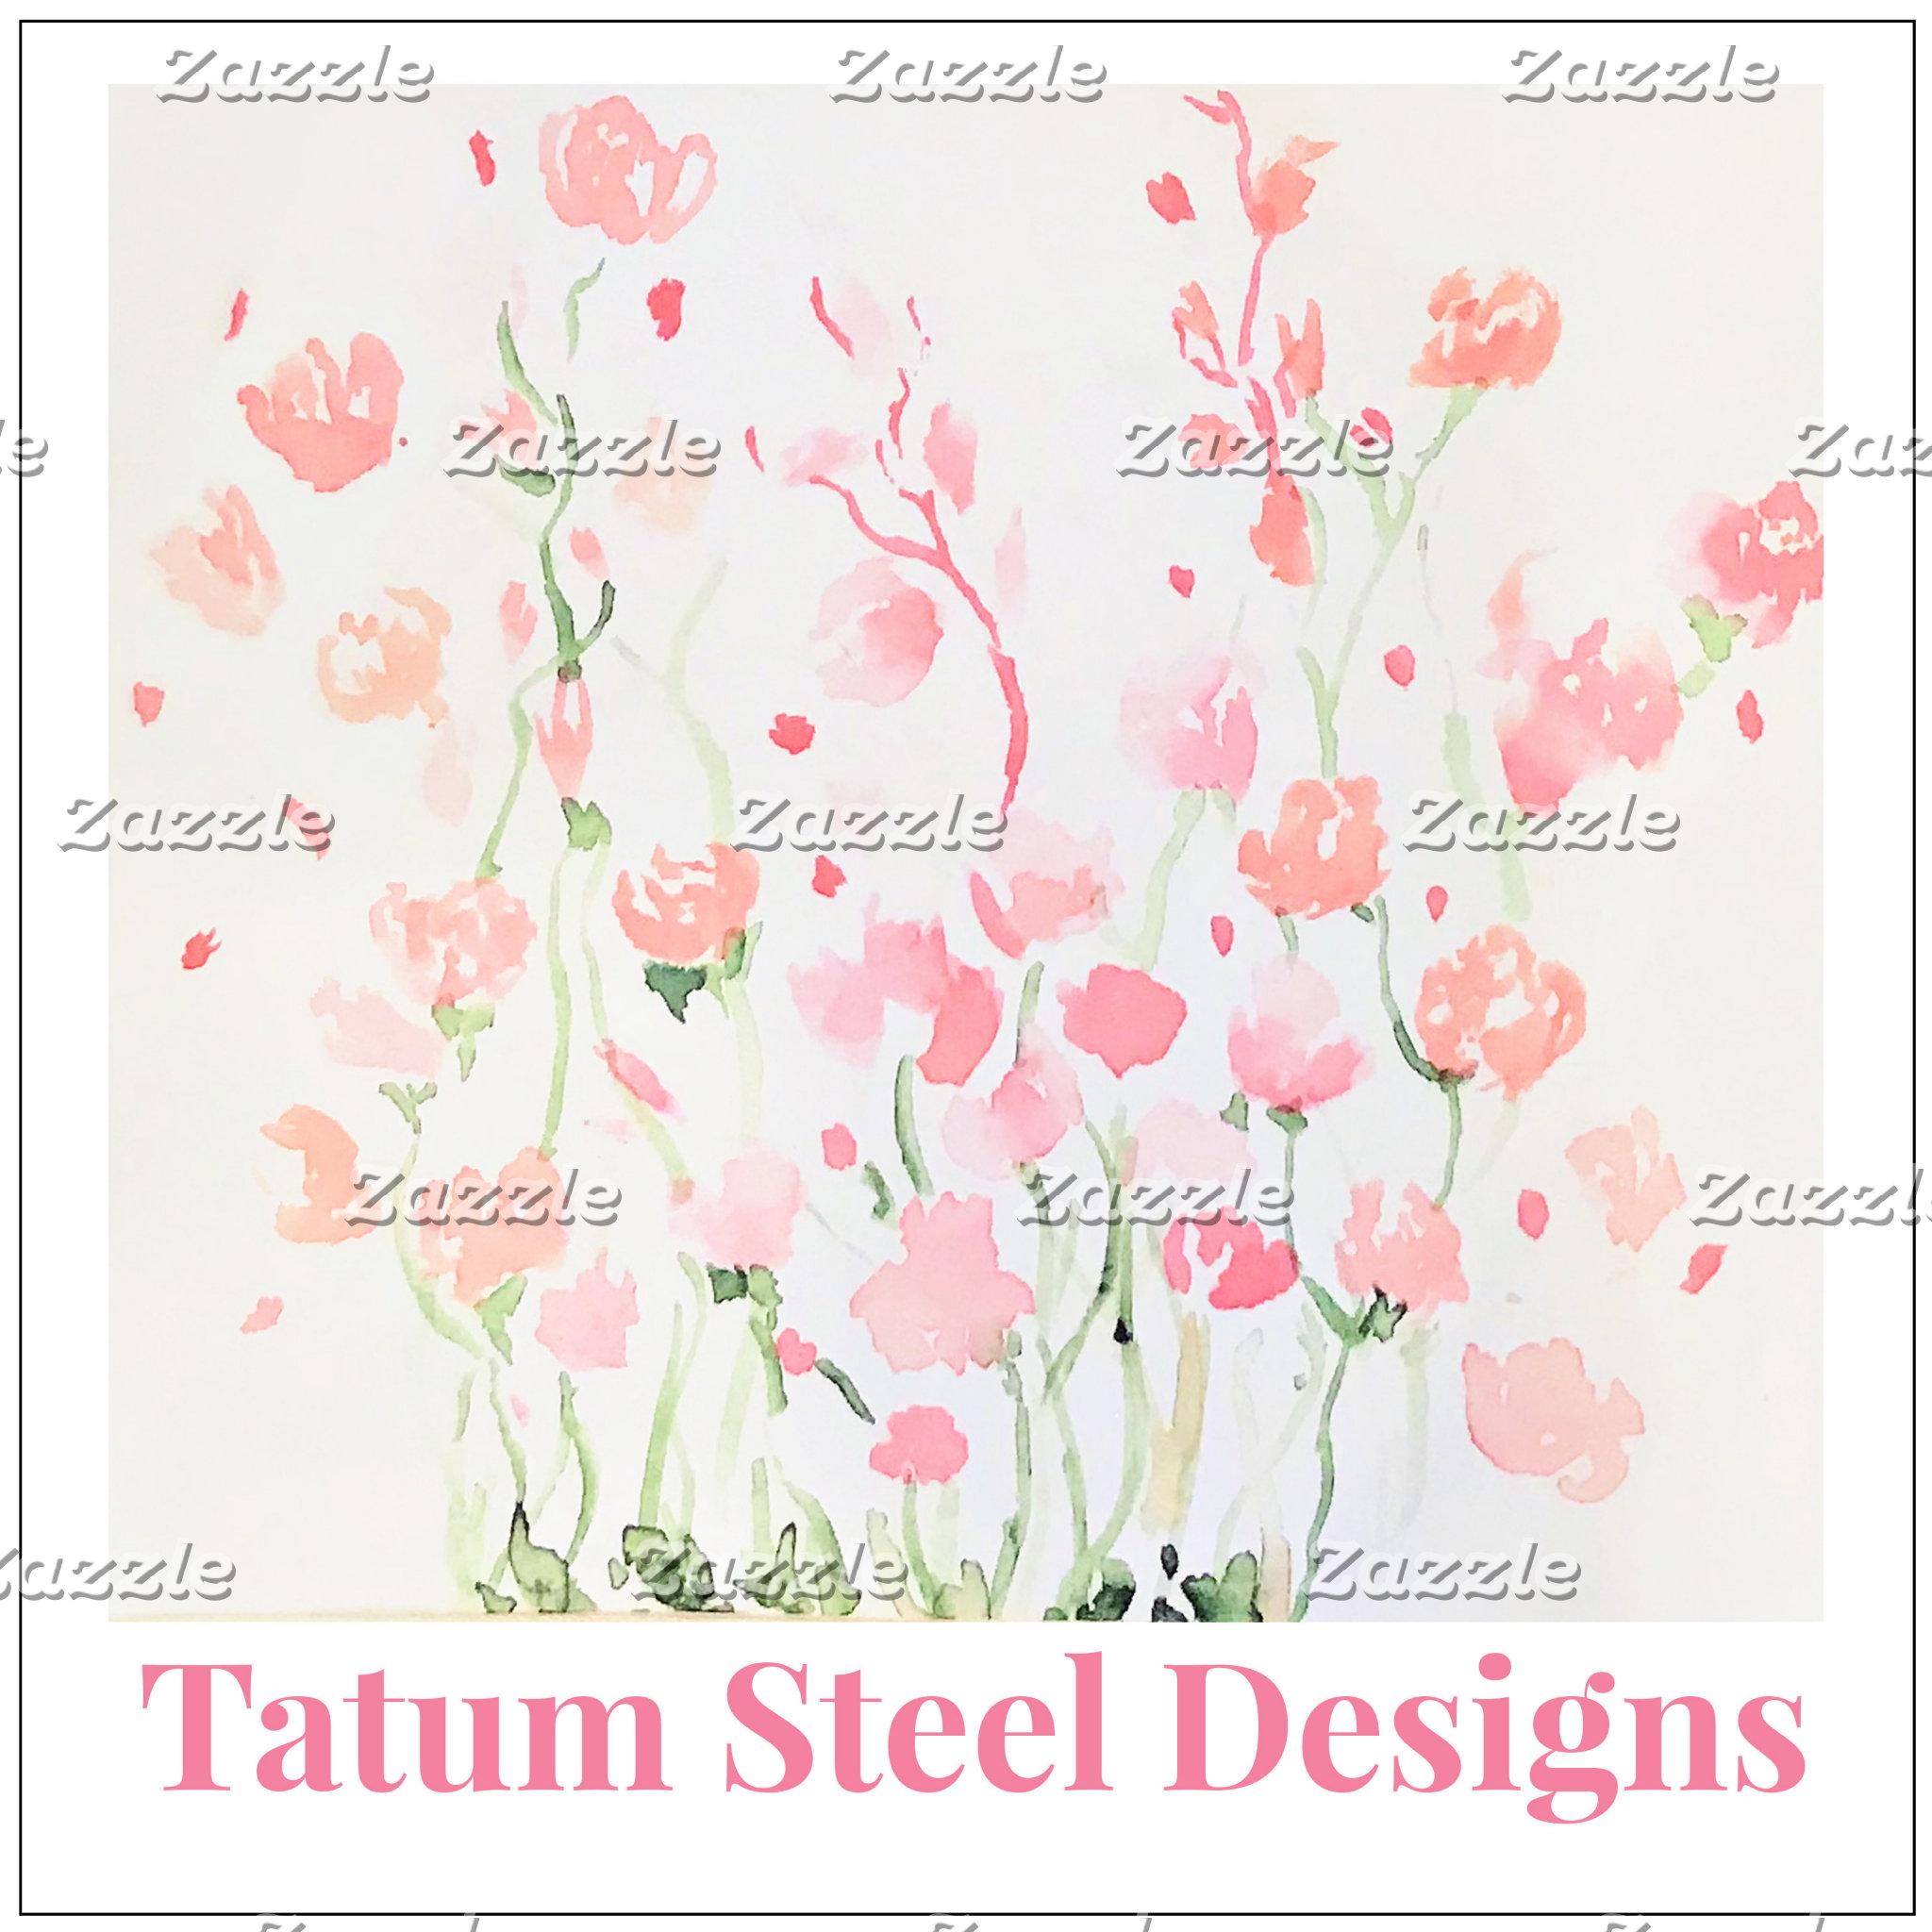 Tatum Steel Designs